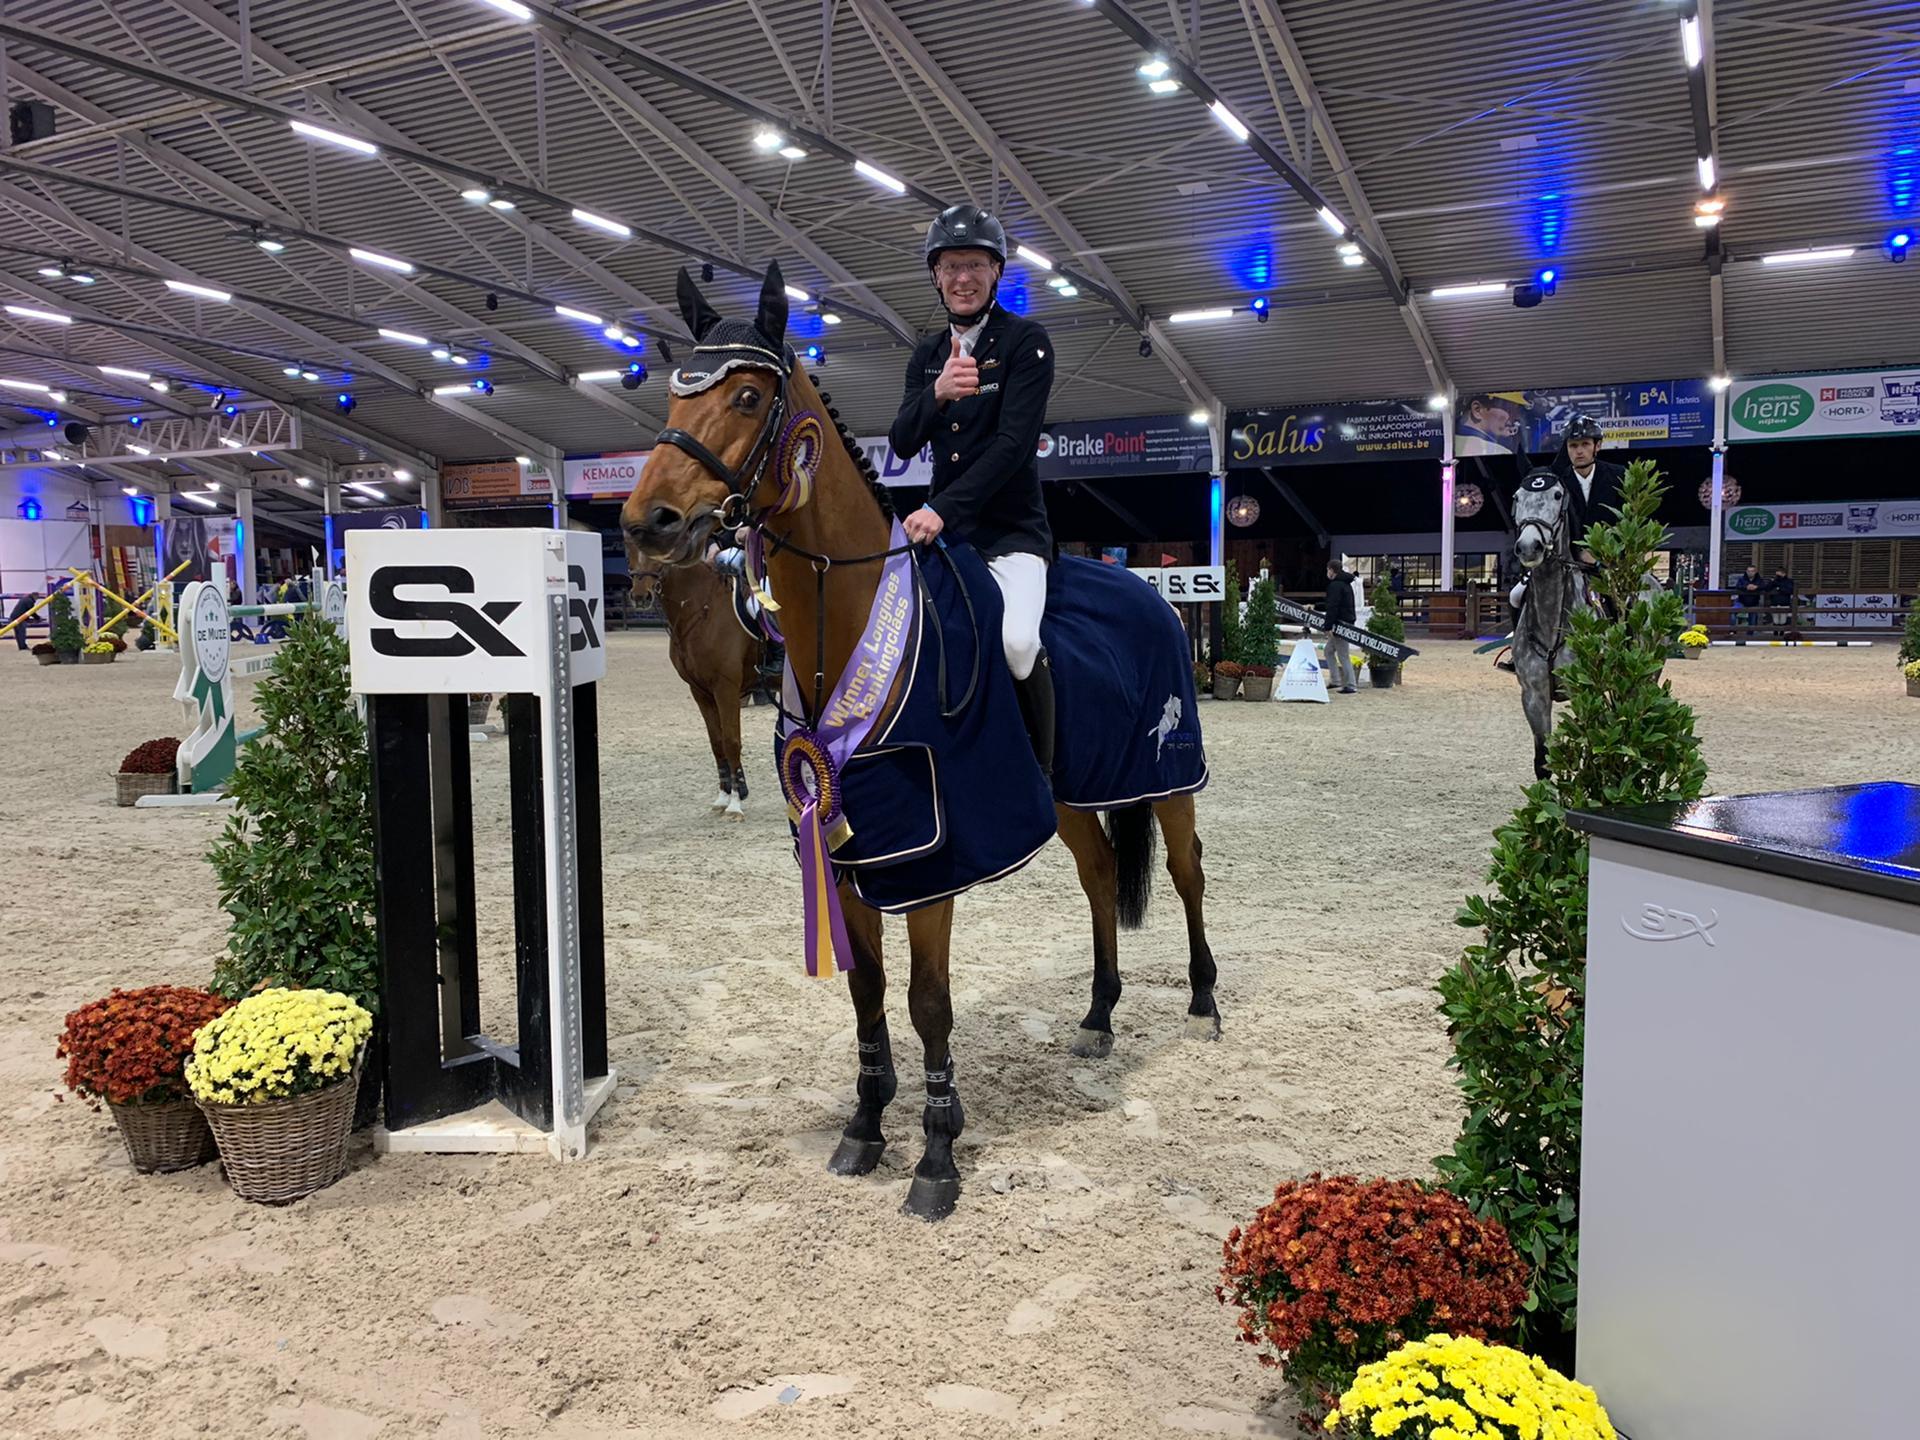 Rieskamp-Goedeking wins Longines Rankingclass of Azelhof